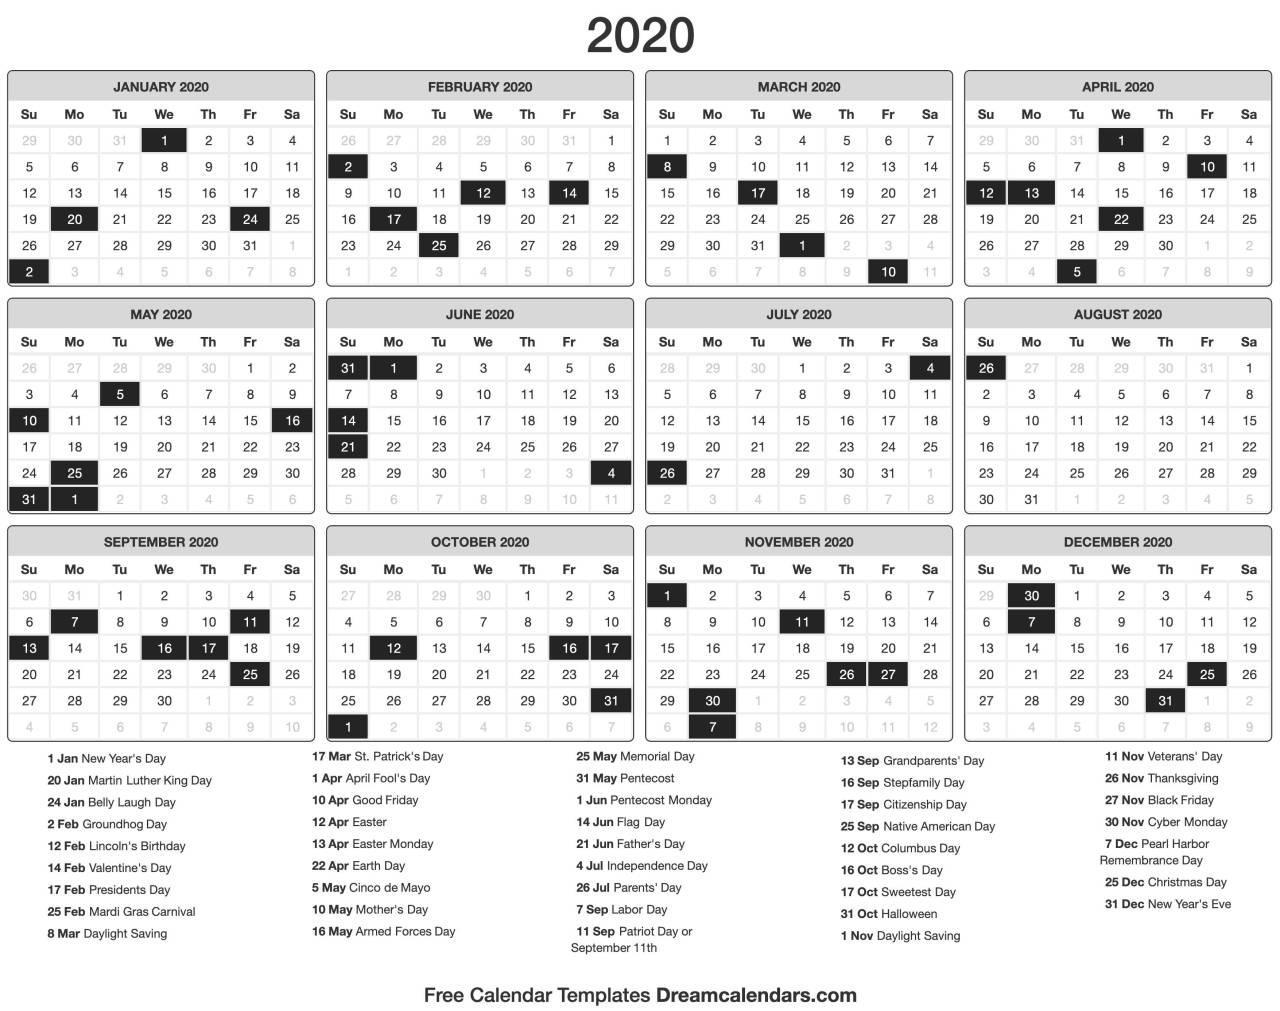 Dream Calendars: Make It 2020 Template — Printable 2020